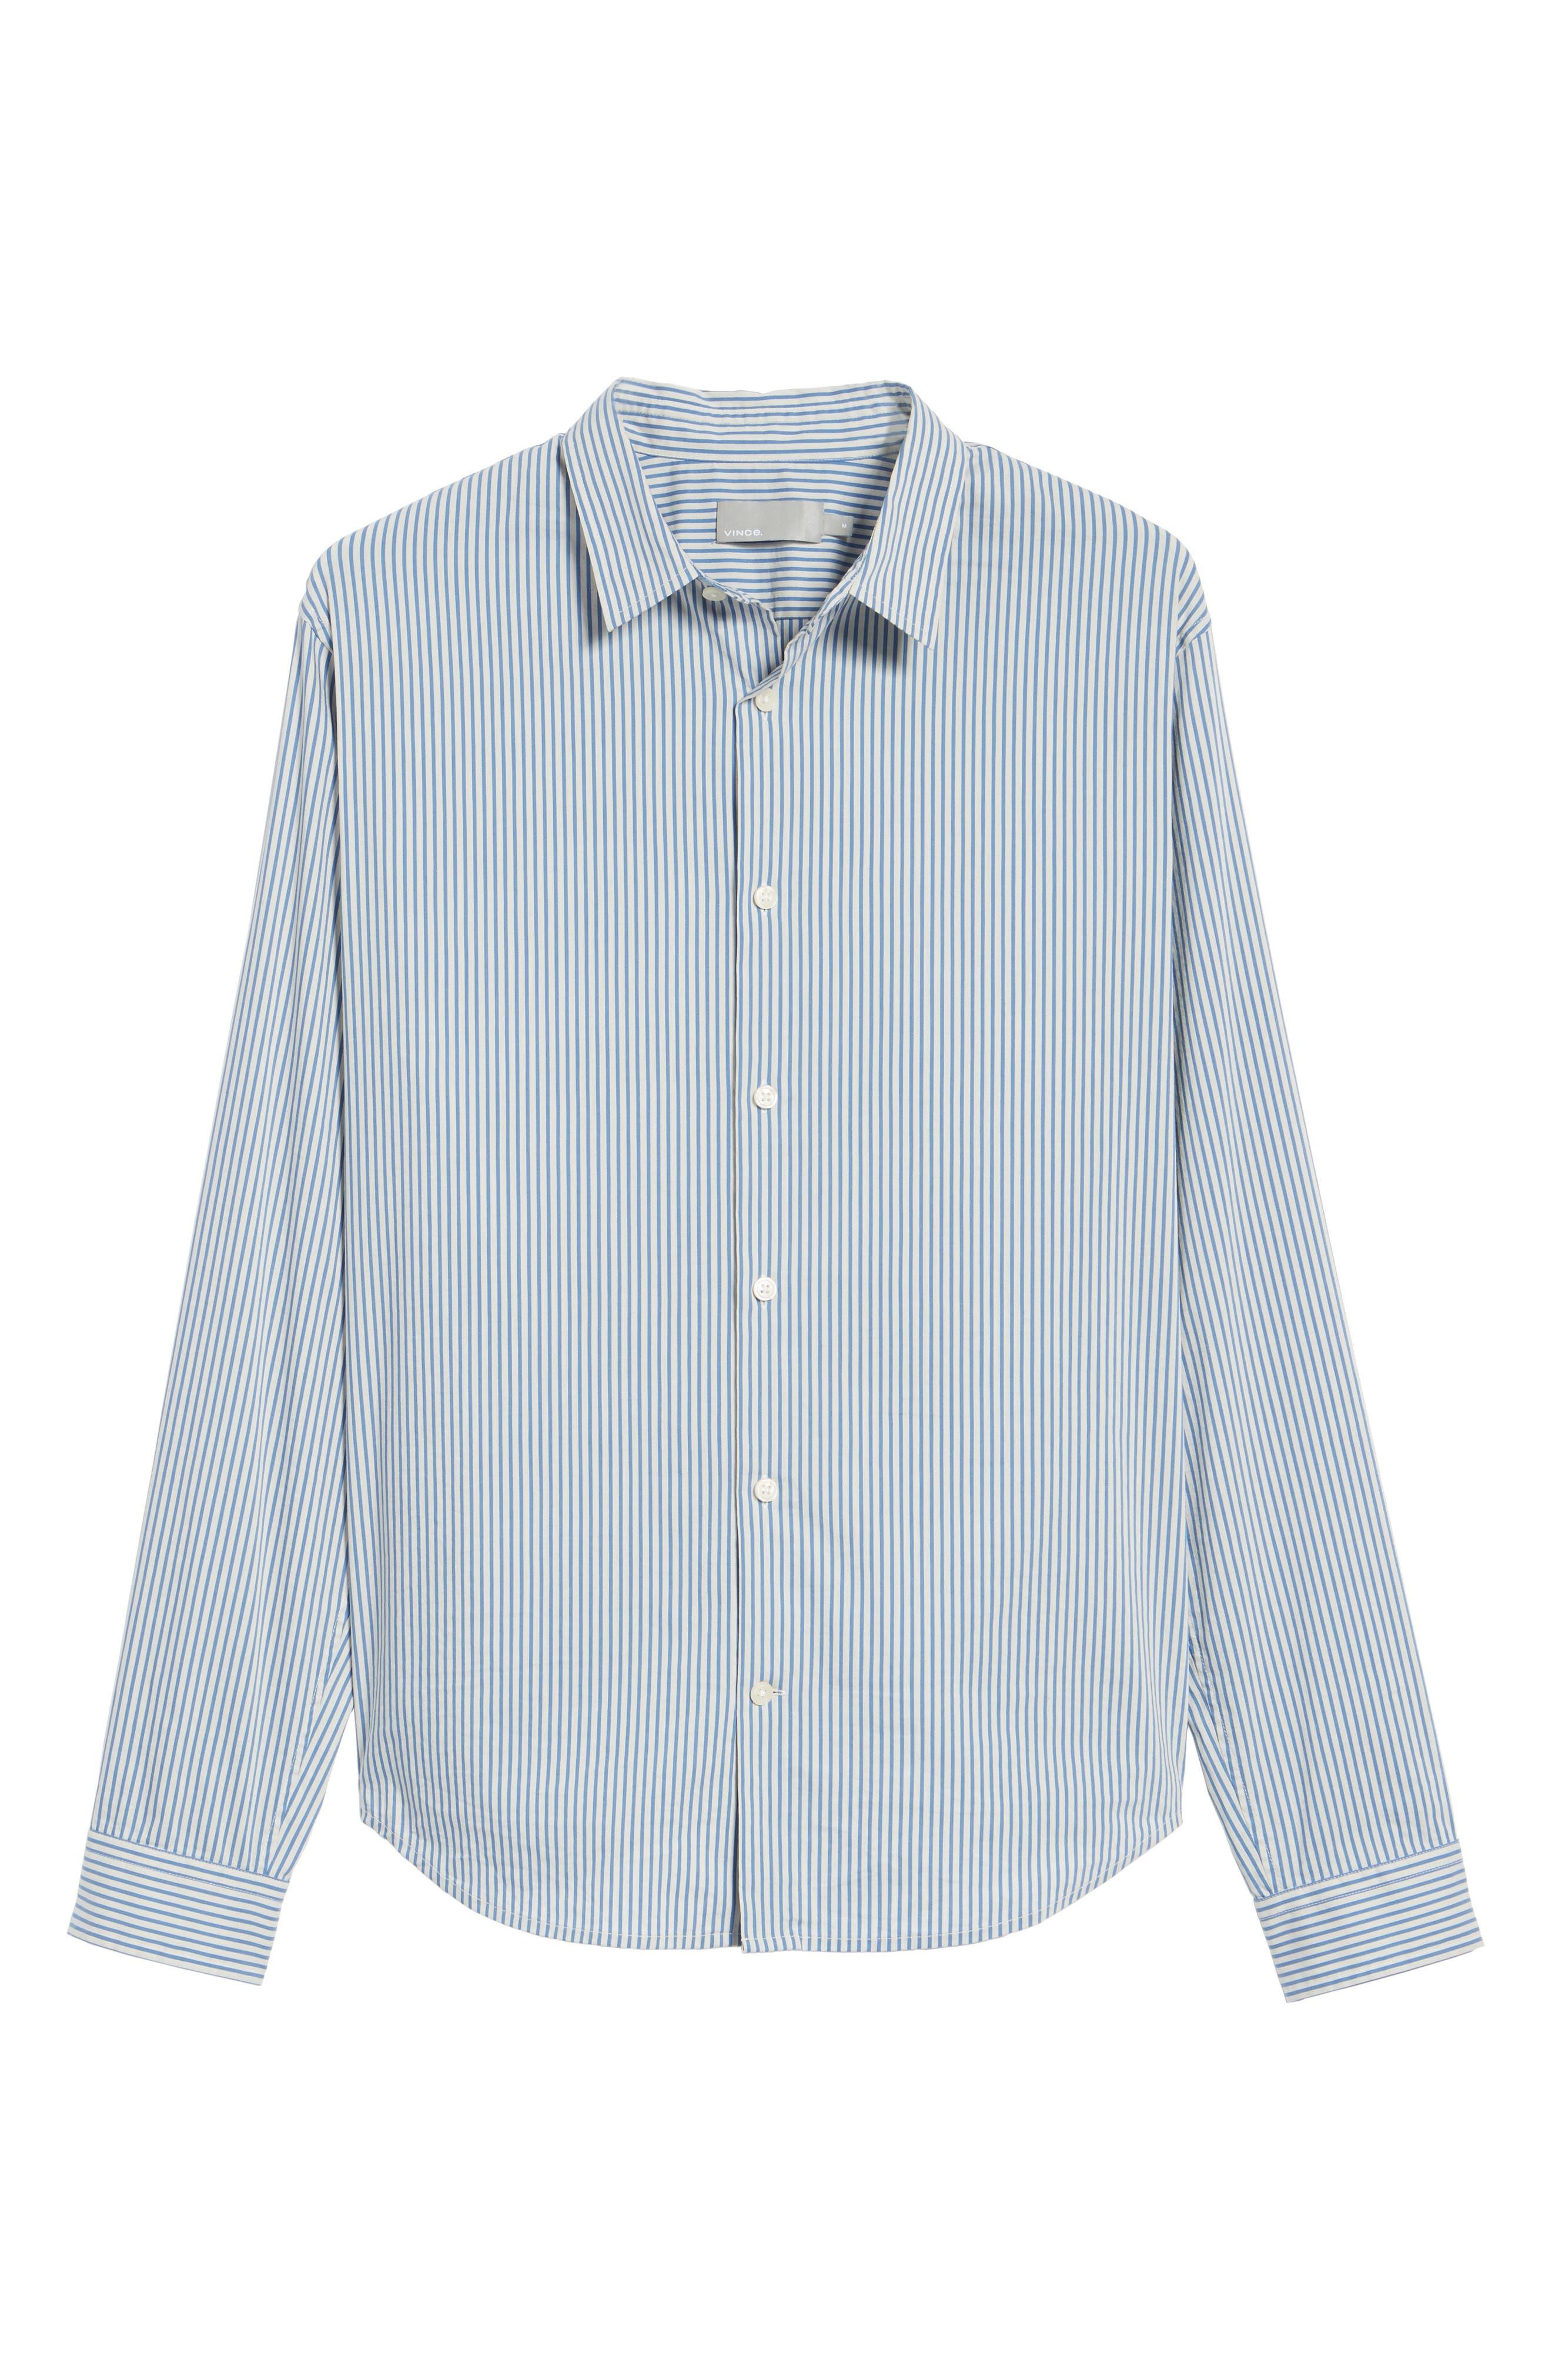 Regular Fit Stripe Sport Shirt,                             Alternate thumbnail 6, color,                             100